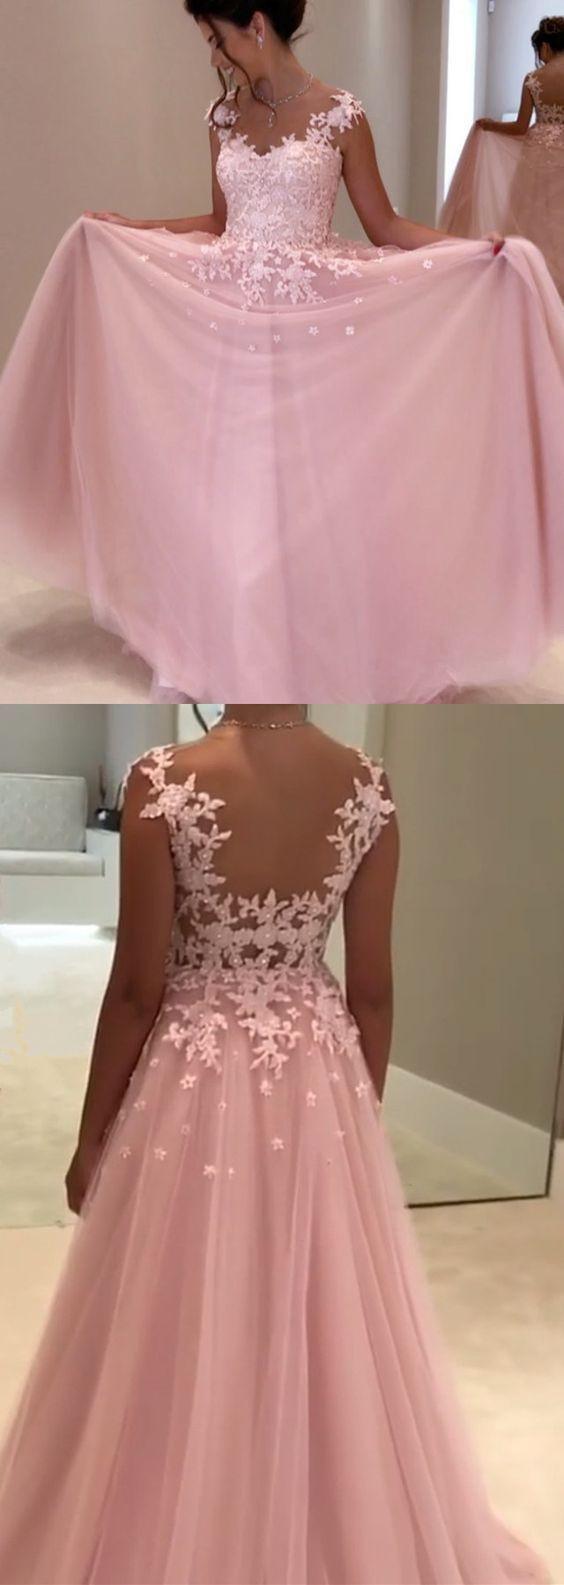 Designer Wunderbar Abendkleider Rose Ärmel Top Abendkleider Rose Boutique